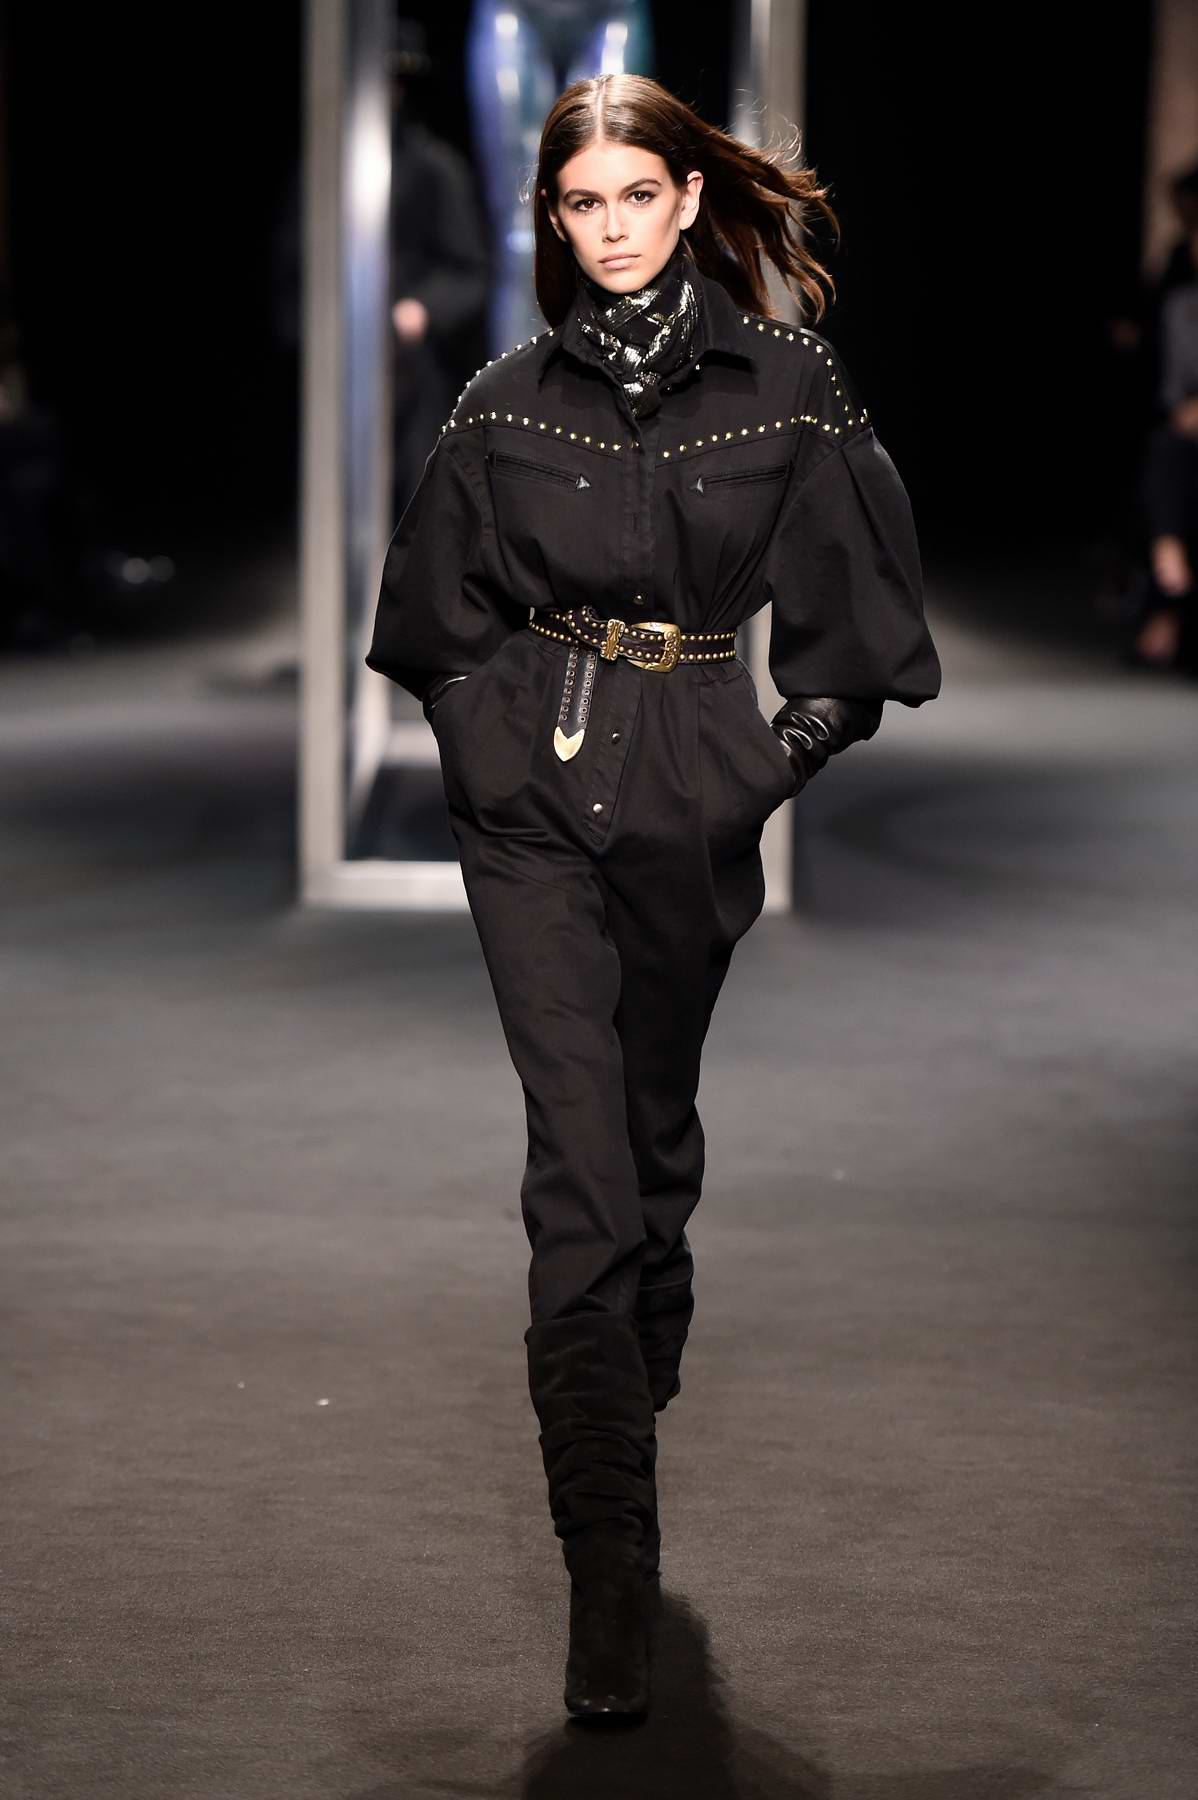 Kaia Gerber walking for Alberta Ferretti Fall Winter Show during Milan Fashion Week in Milan, Italy